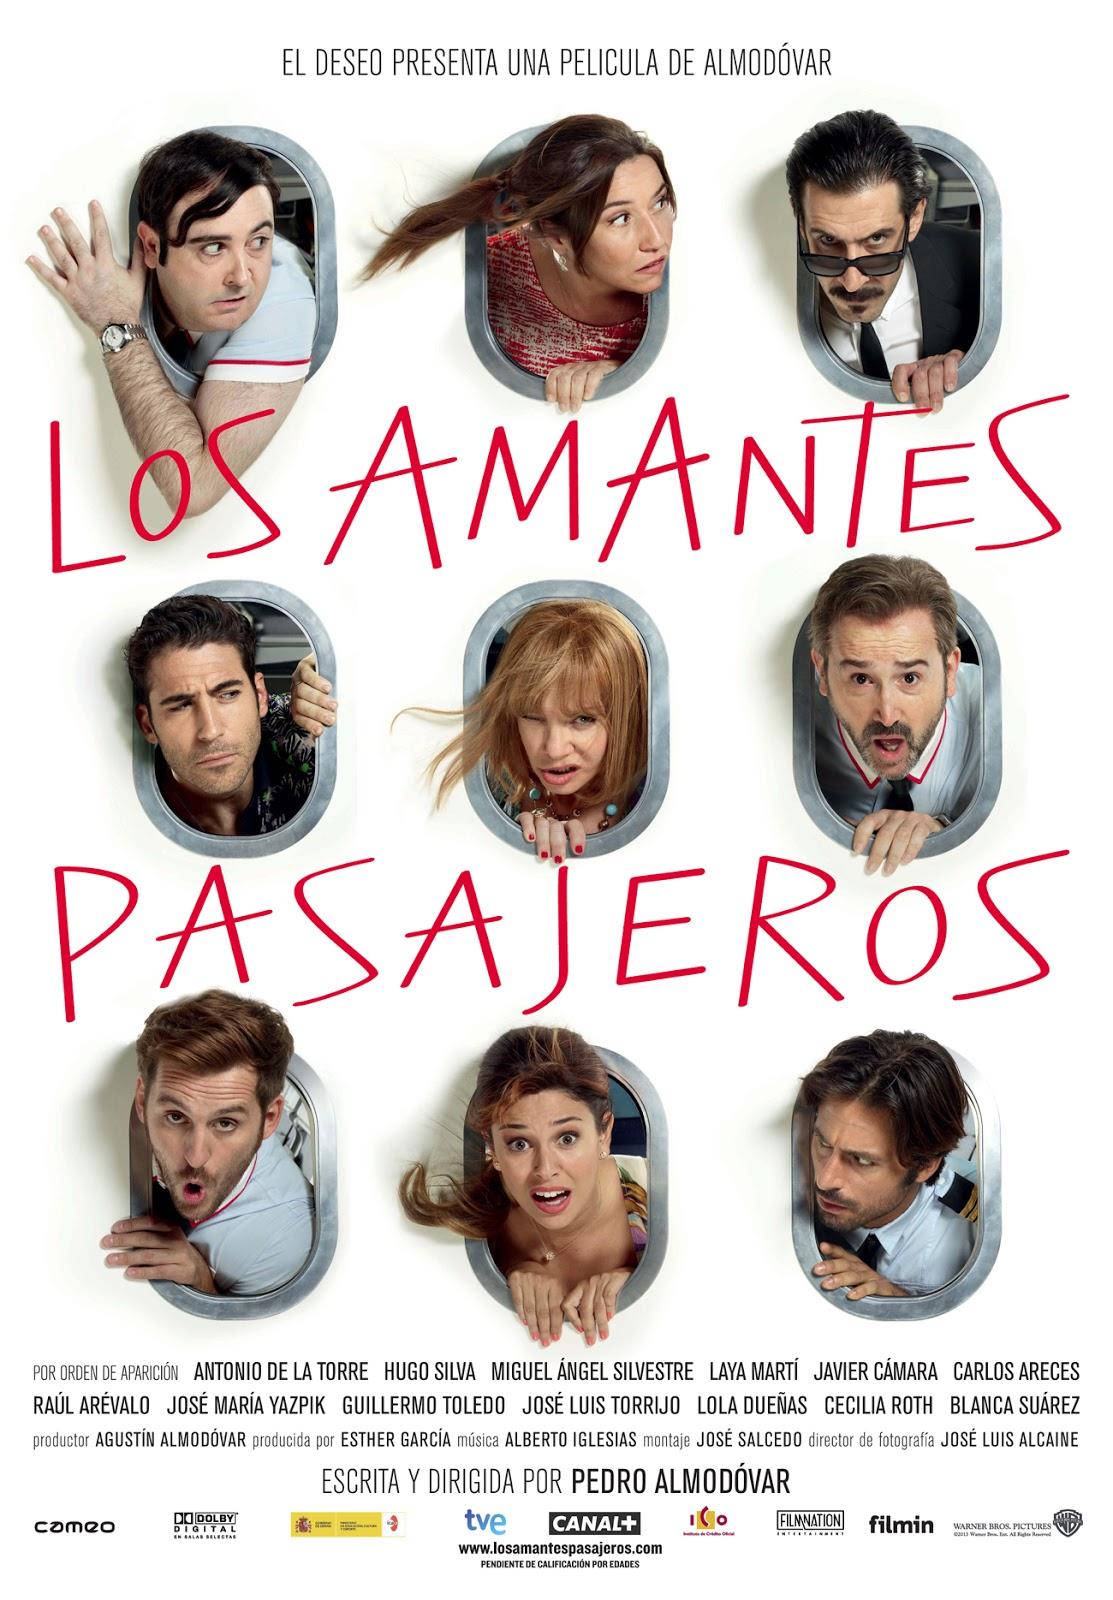 http://1.bp.blogspot.com/--TVRBw3XO3k/URfQ5EbE8uI/AAAAAAAAG4s/oQ3Y7L3pJpI/s1600/Los-Amantes-Pasajeros2.jpg